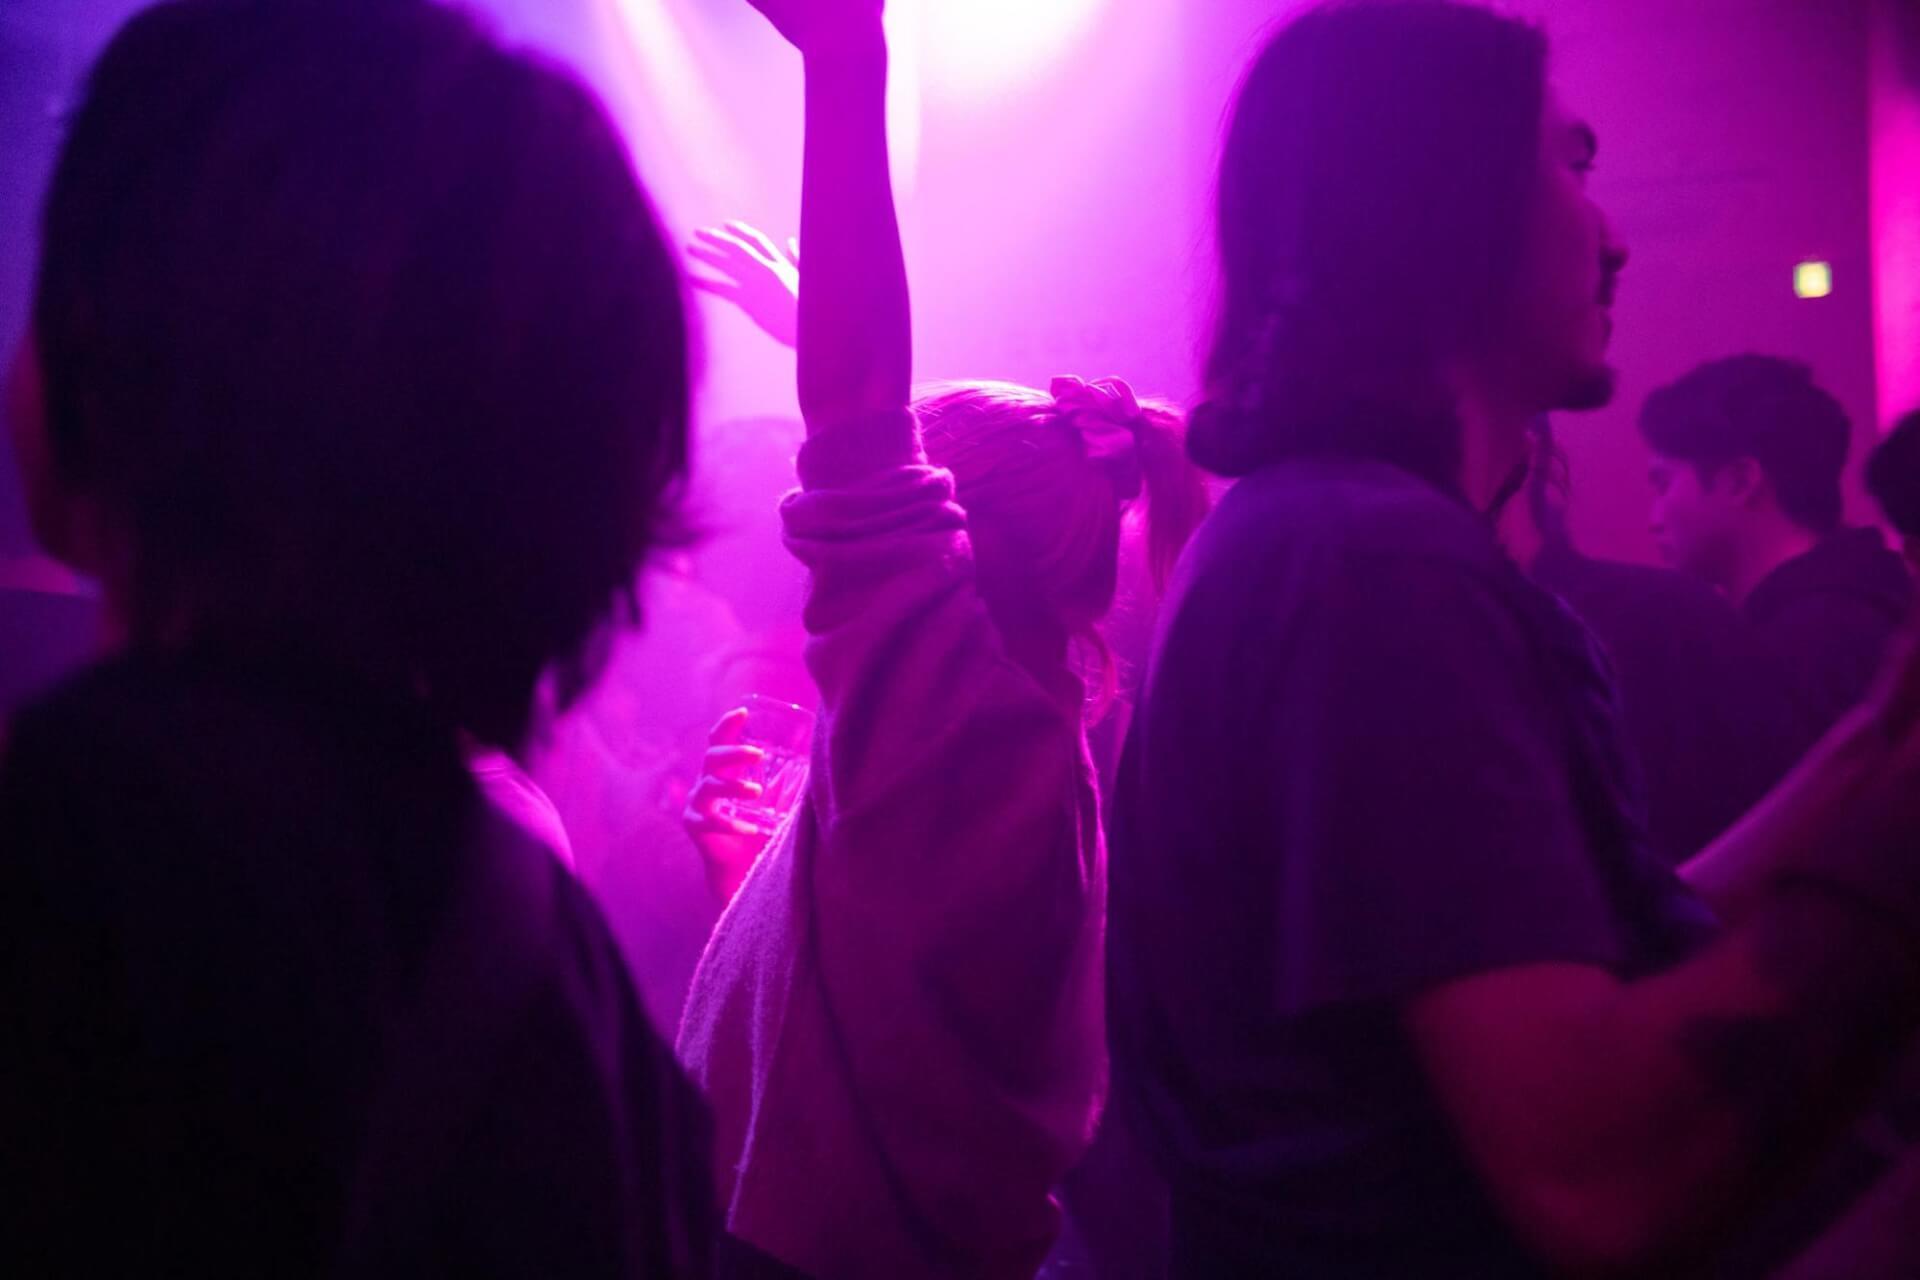 Floating Points at KEWL 2nd Anniversary Party。ダンスミュージックへの初期衝動を想い返した夜 music200116-kewl-floating-points-1